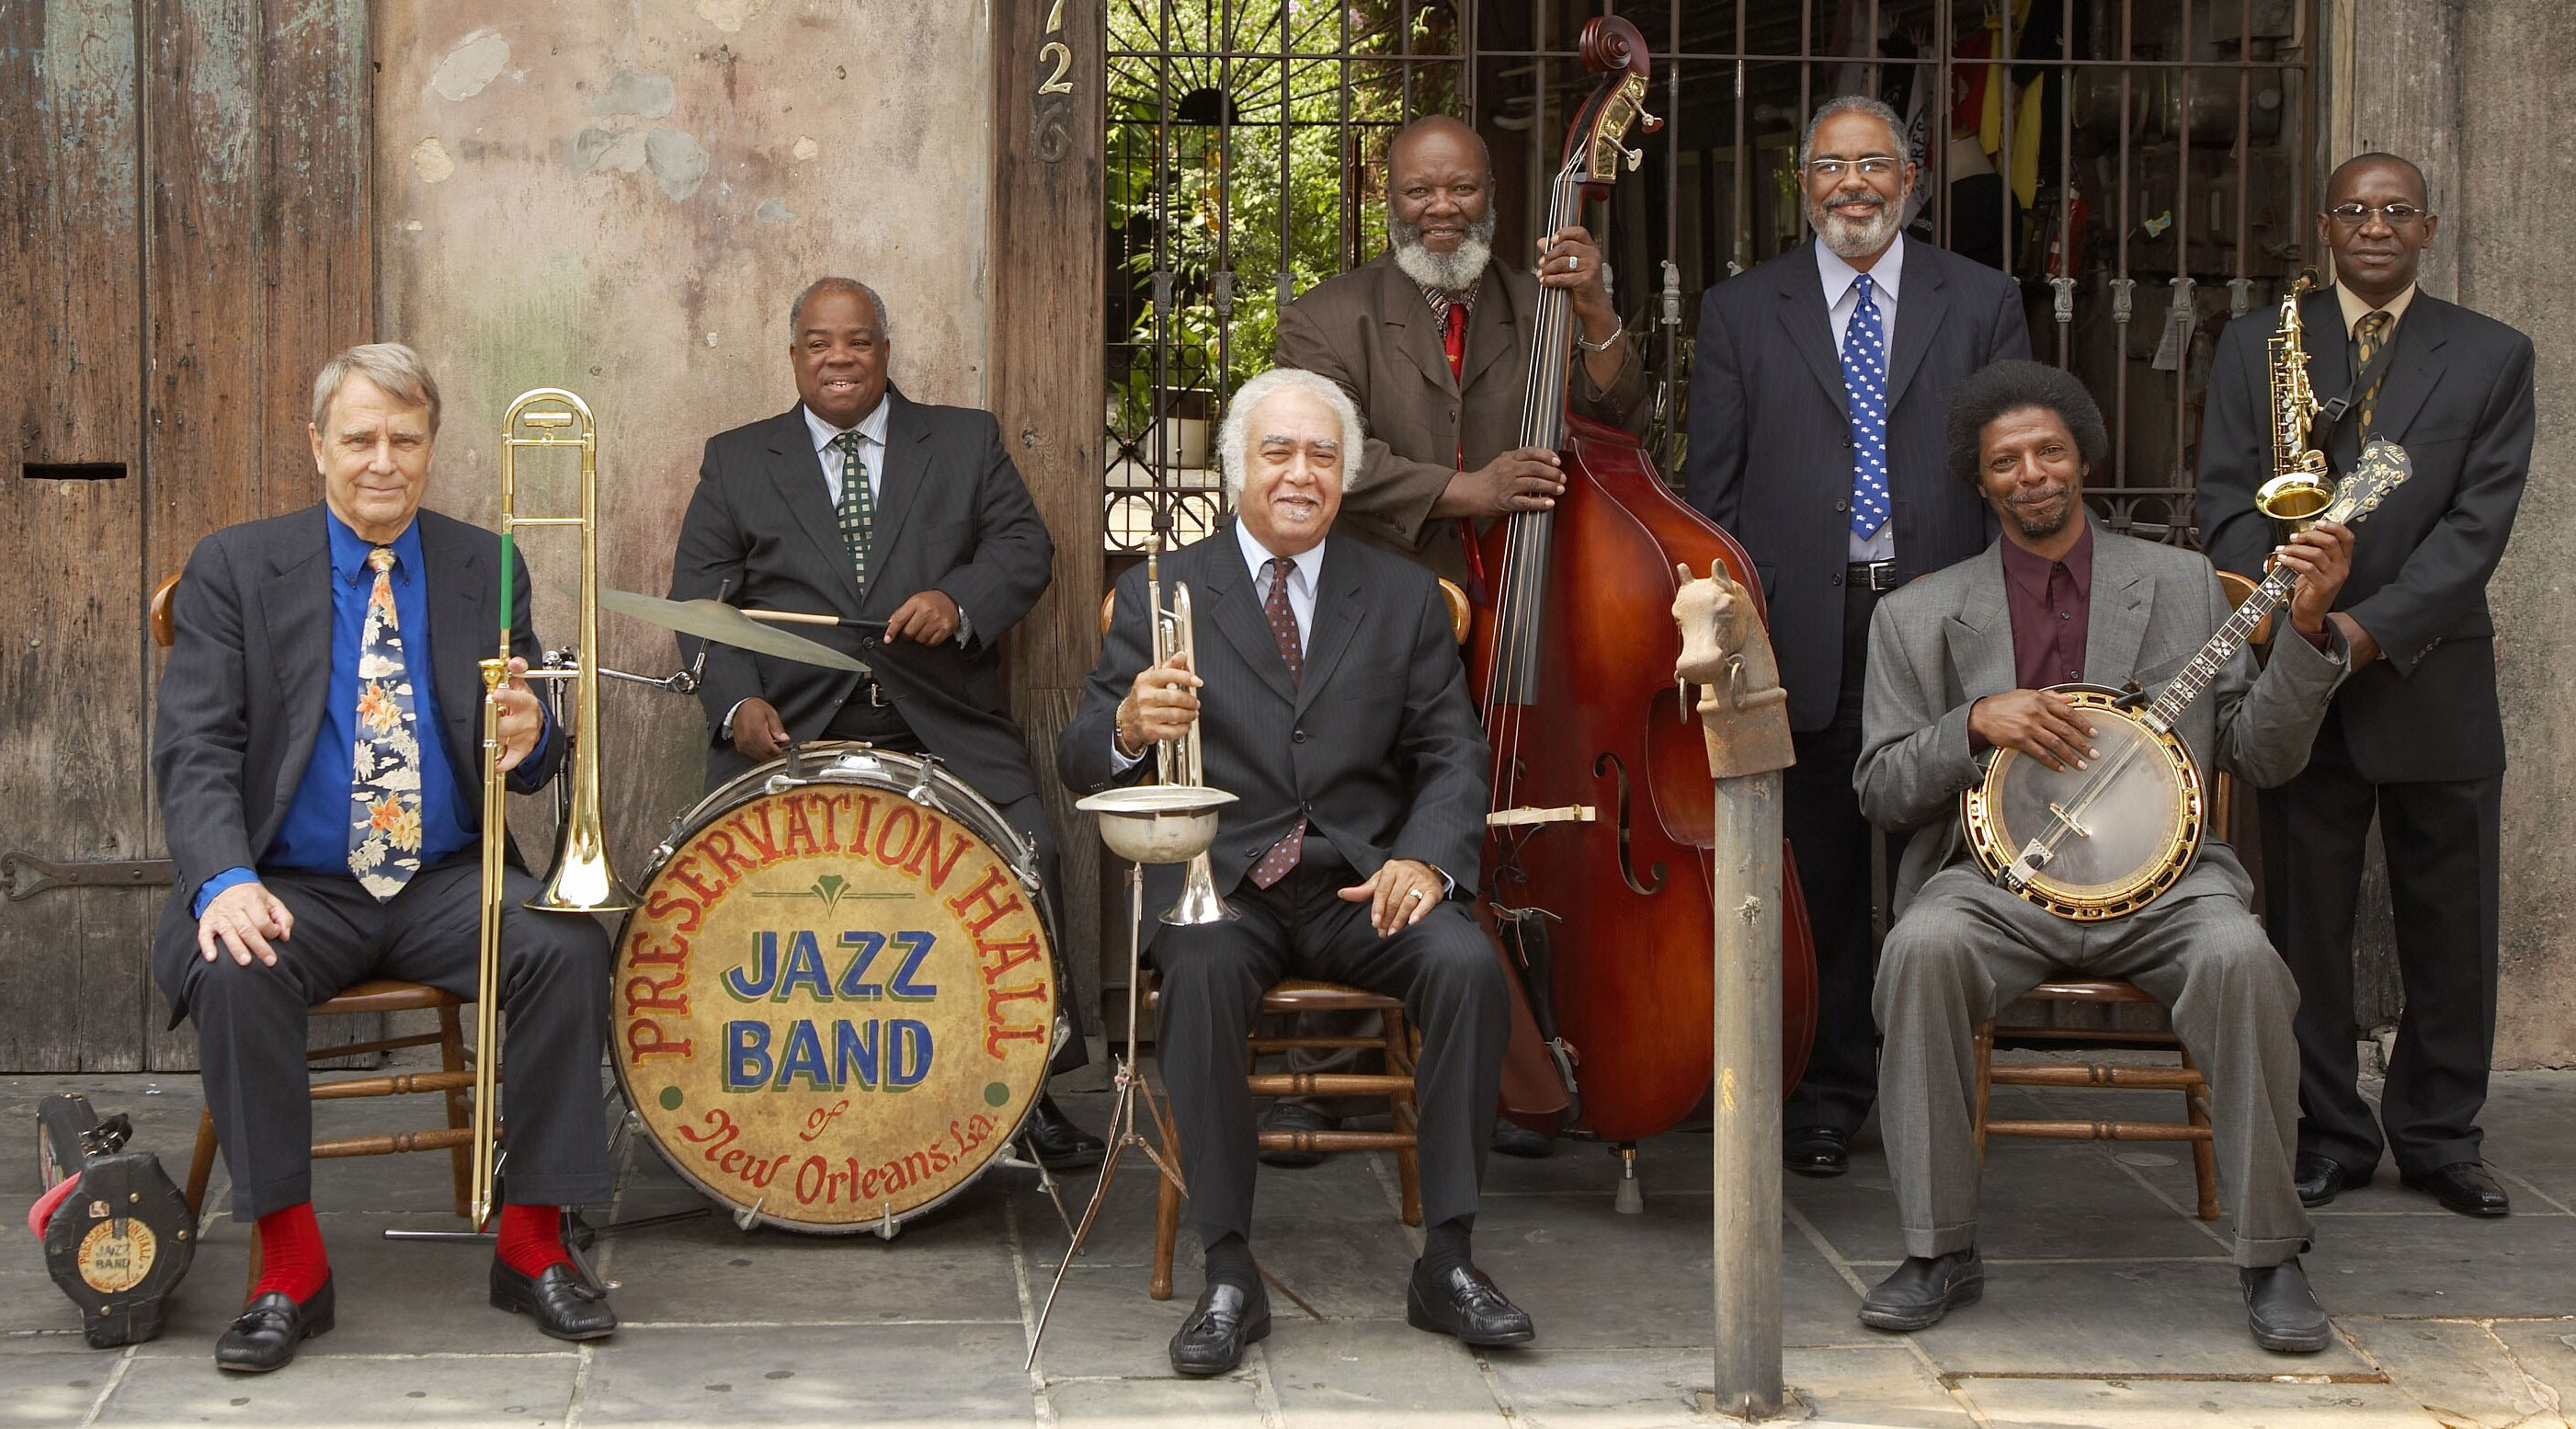 Discografia Indispensable Del Jazz